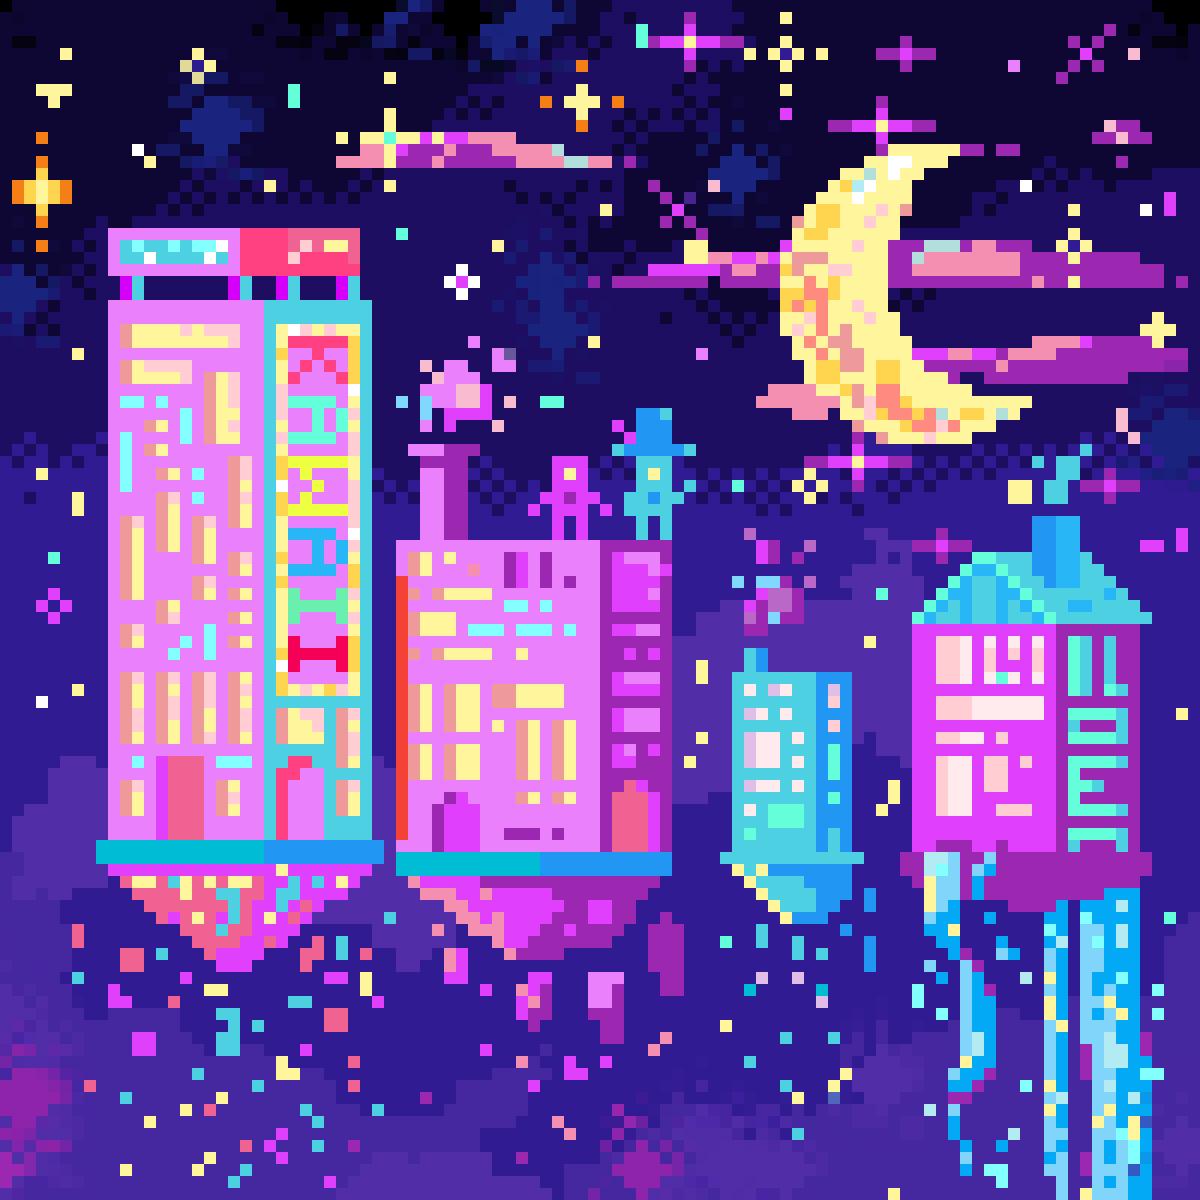 Cosmic City by Peacenlove4all #pixilart #pixelart